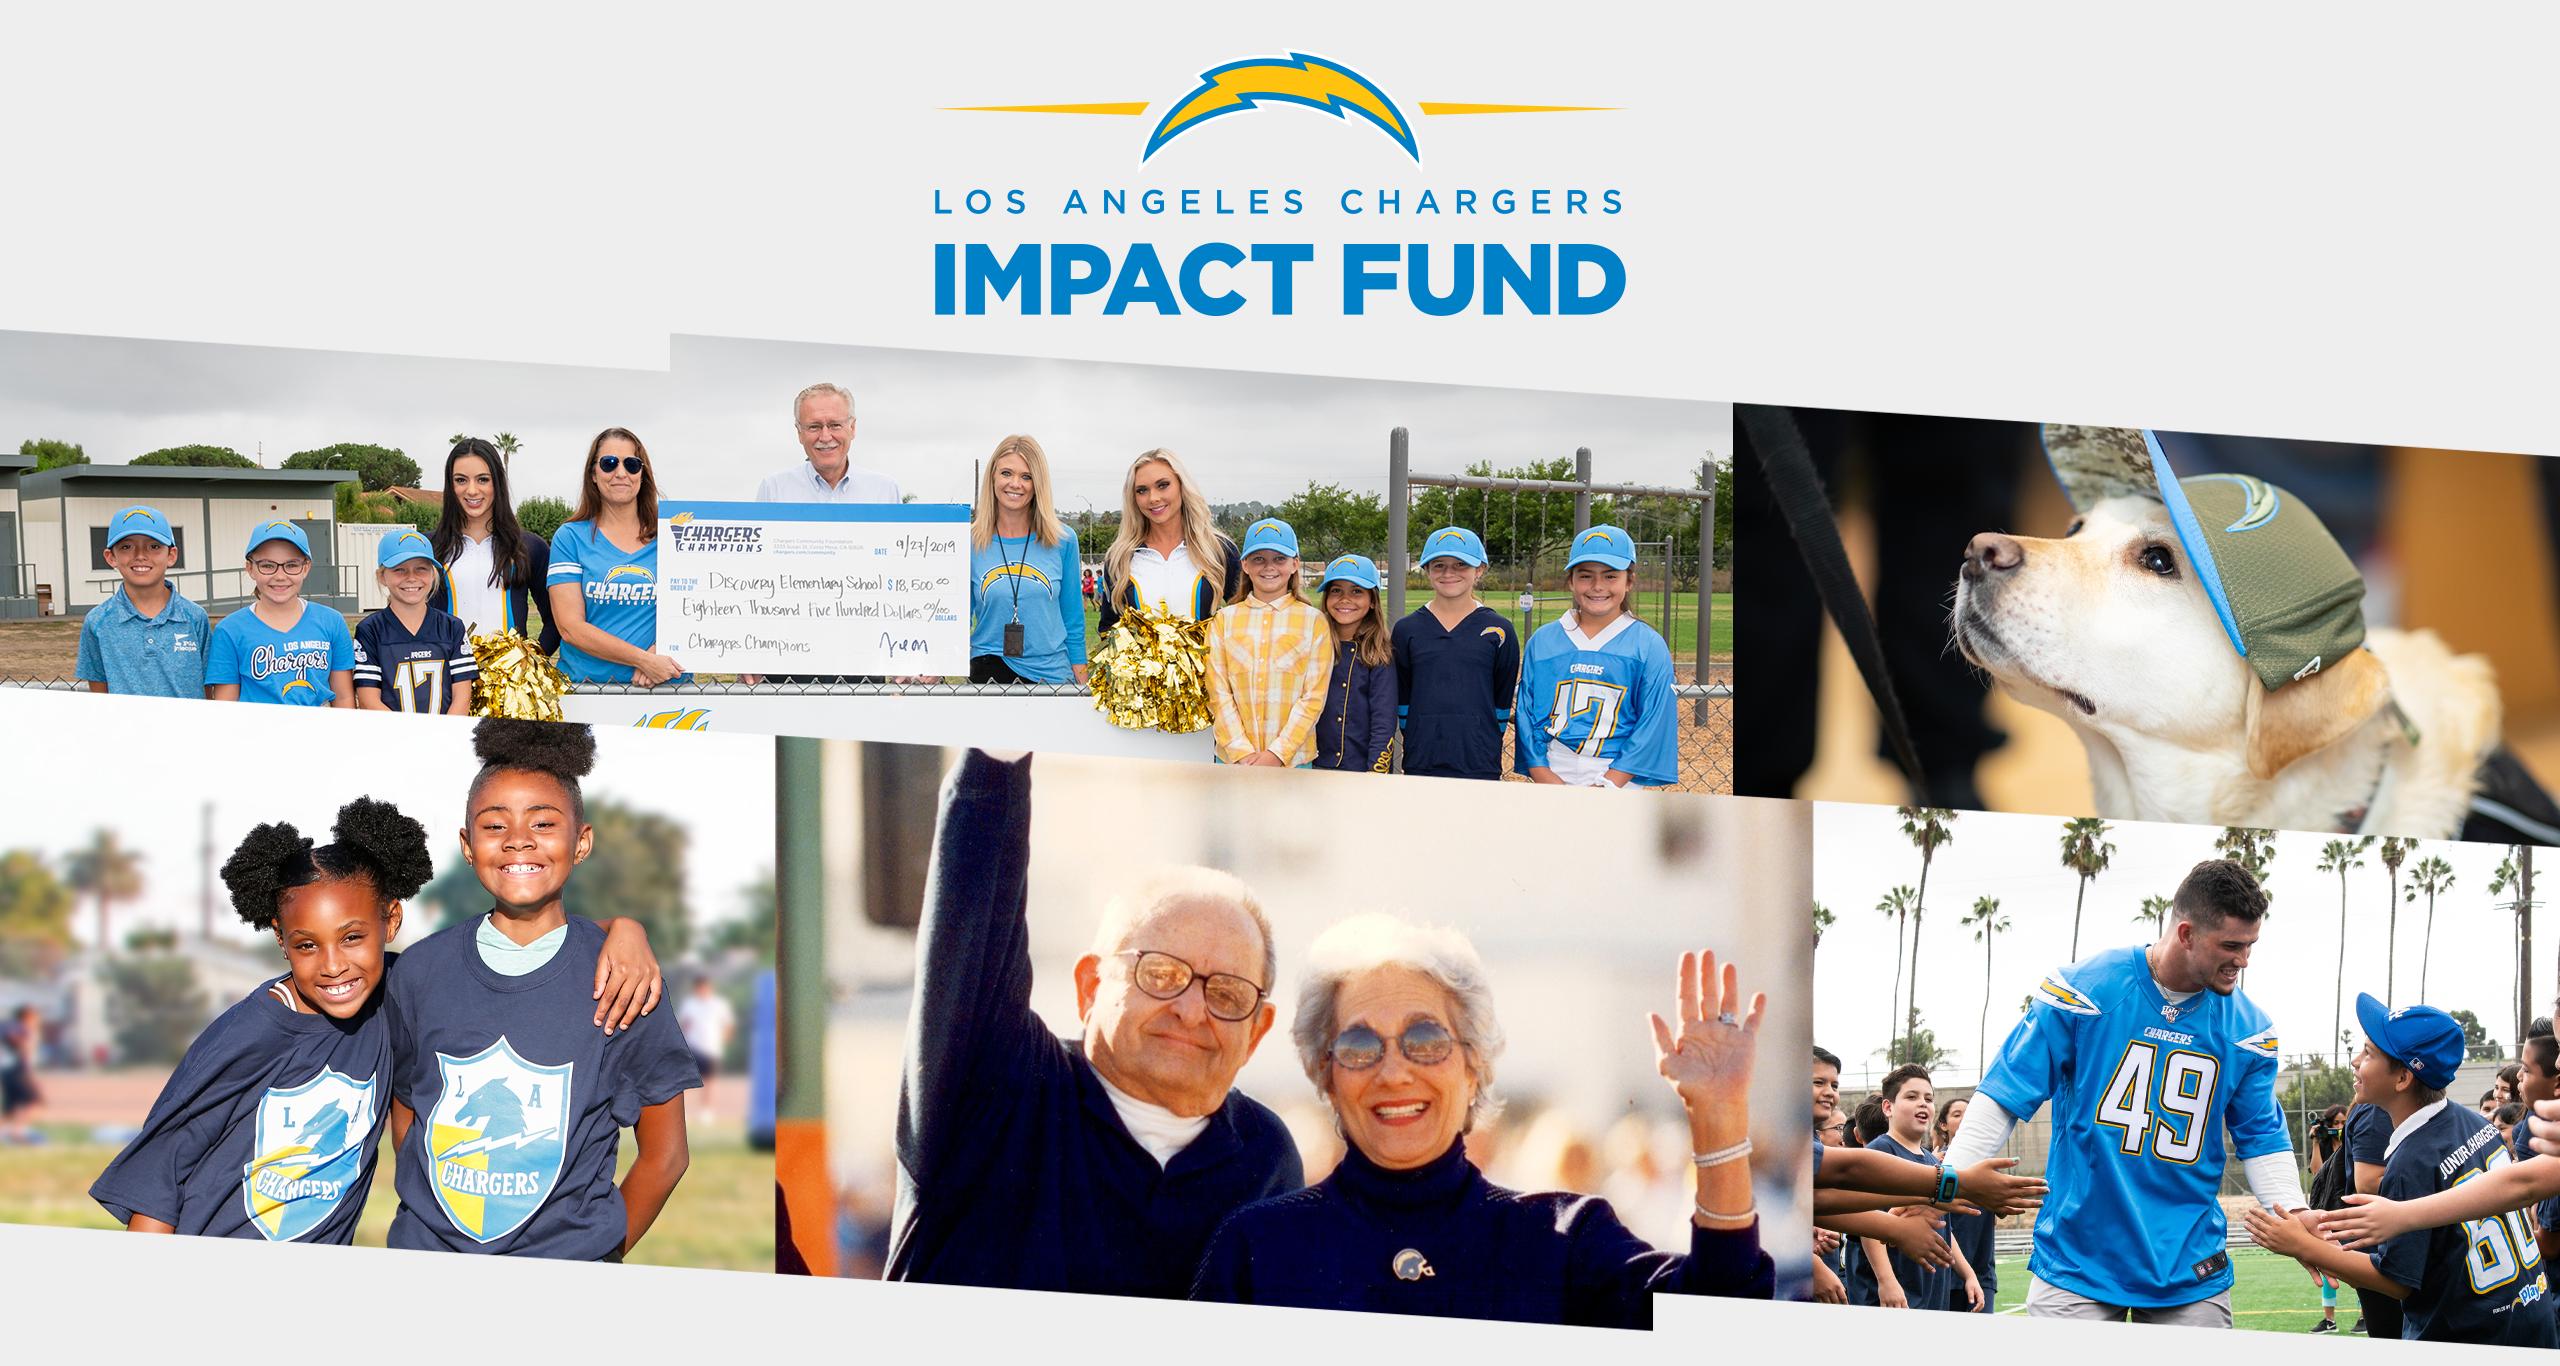 201006_Site_Impact_Fund_Home_Header